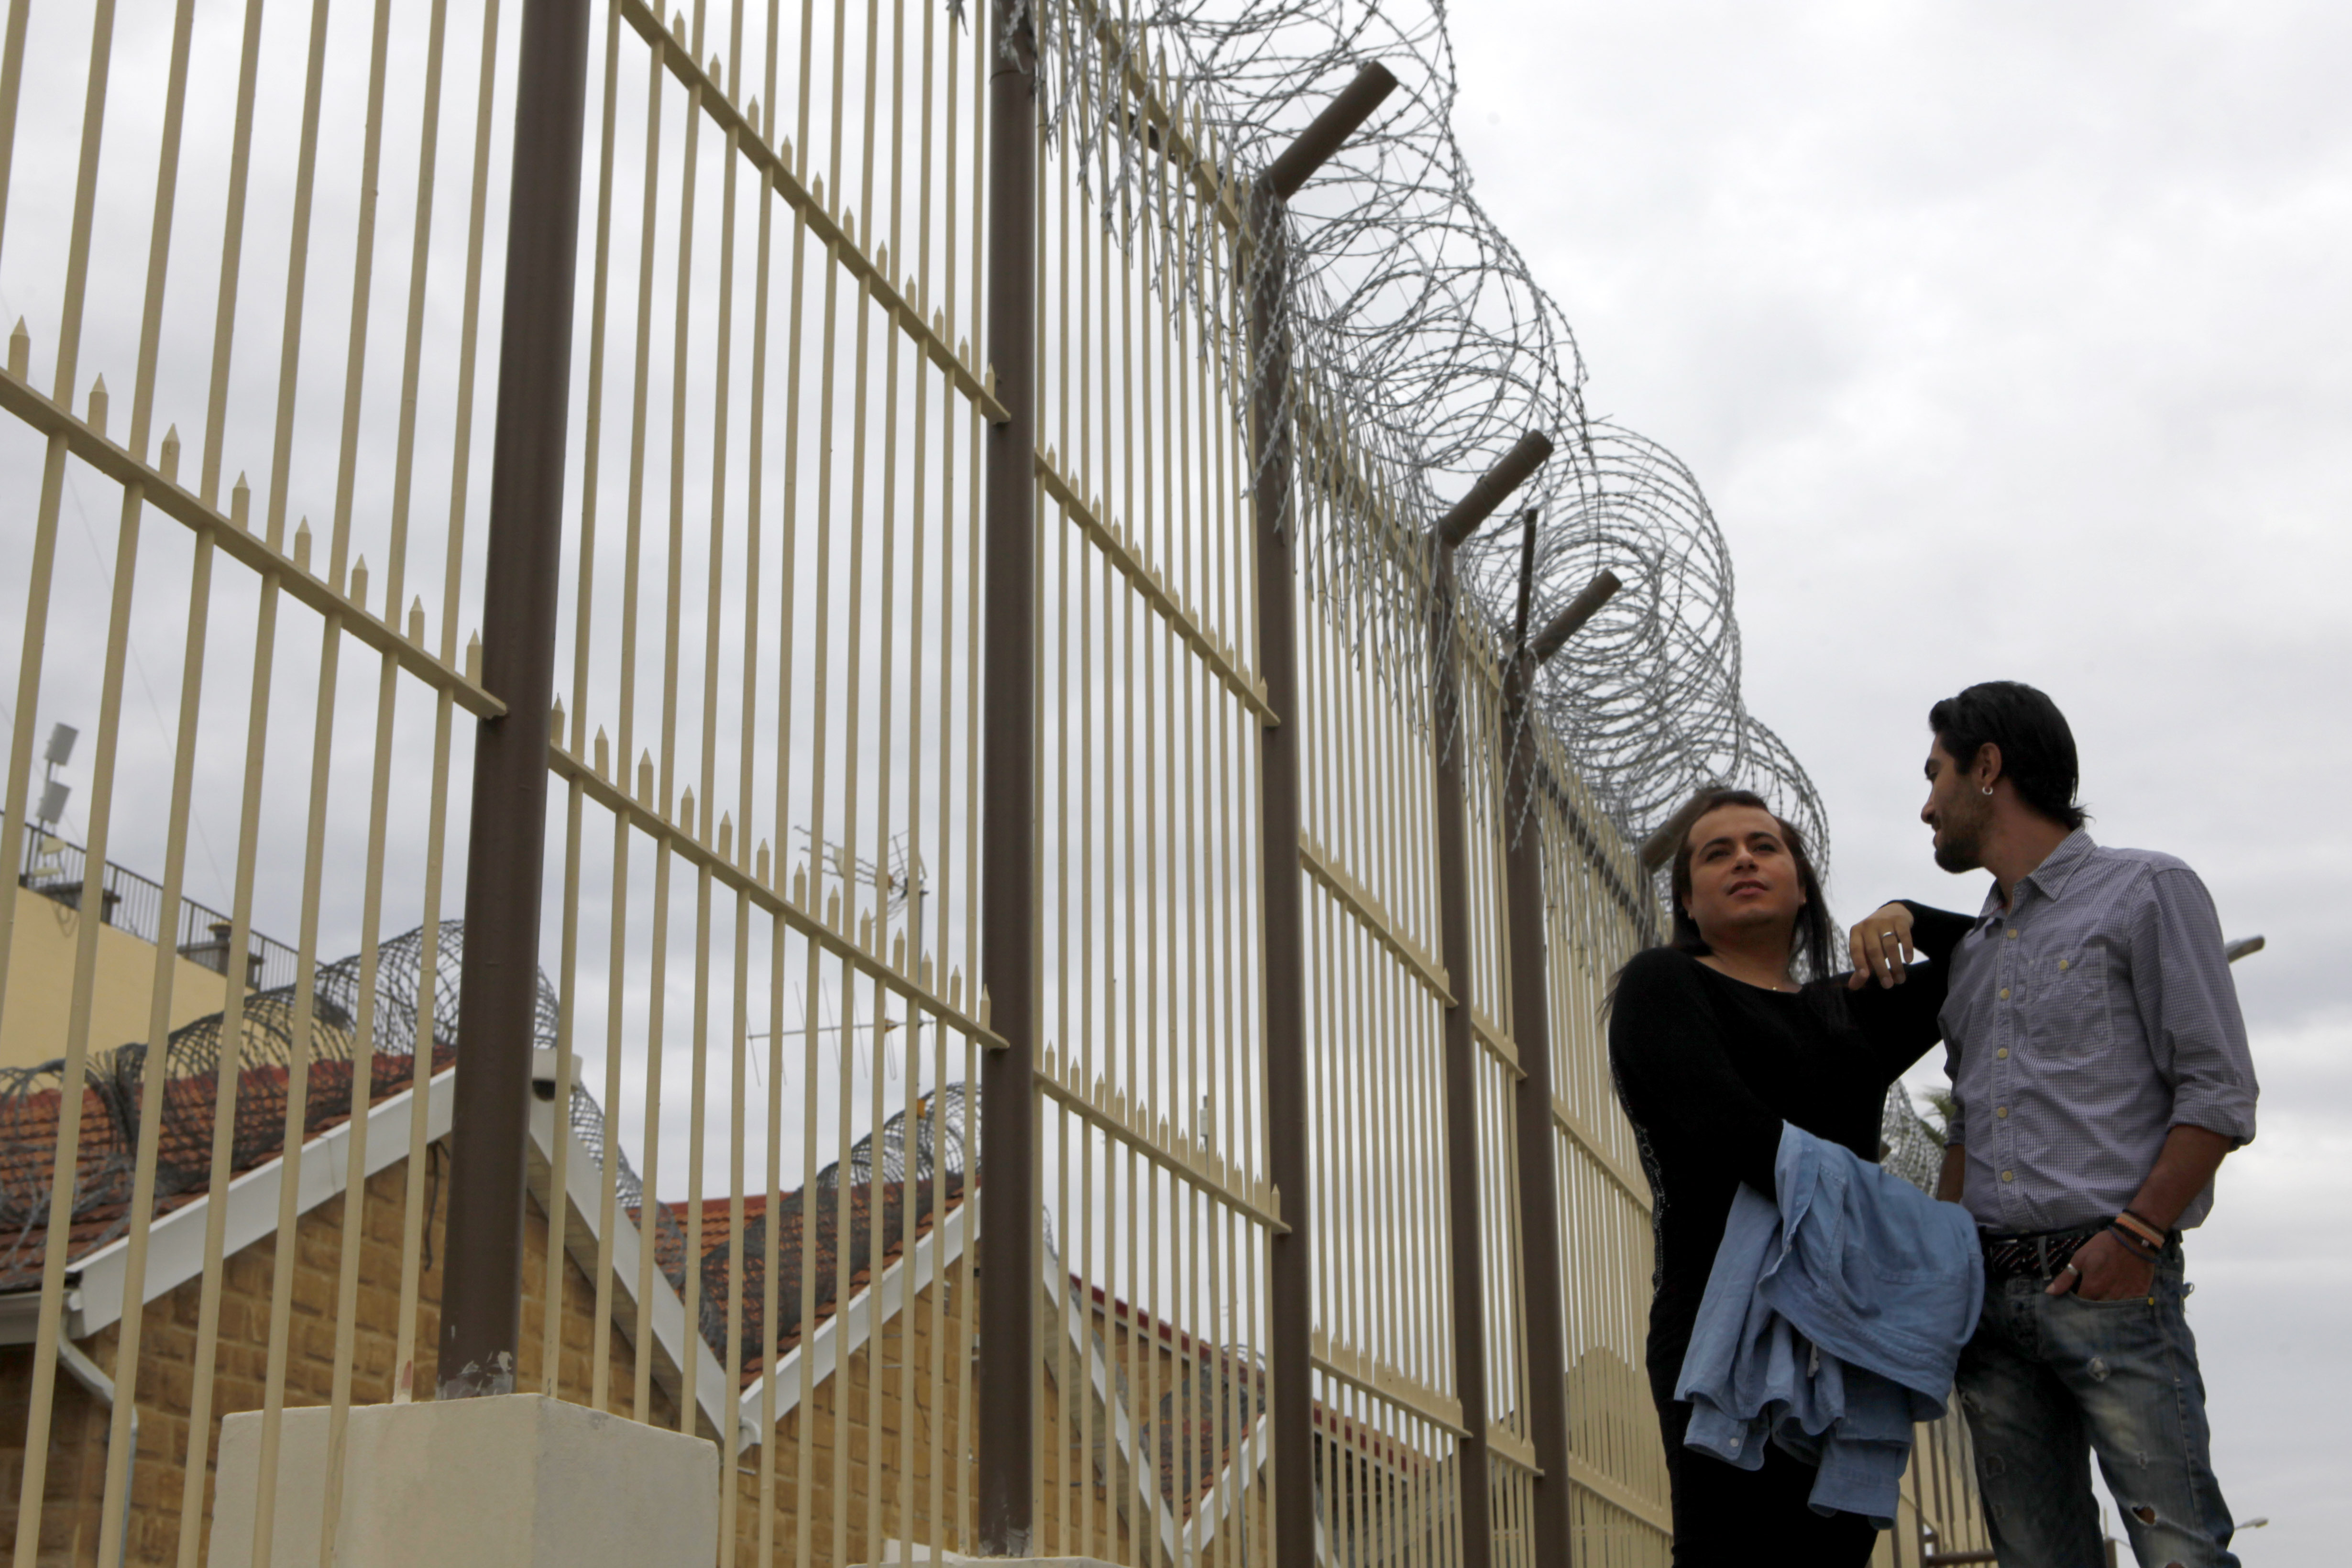 Cypriot Kevork Tontian, right, and Brazilian Wemson Gabral da Costa walk inside the Cyprus' prisons in capital Nicosia, Cyprus, Thursday, Jan. 16, 2020.